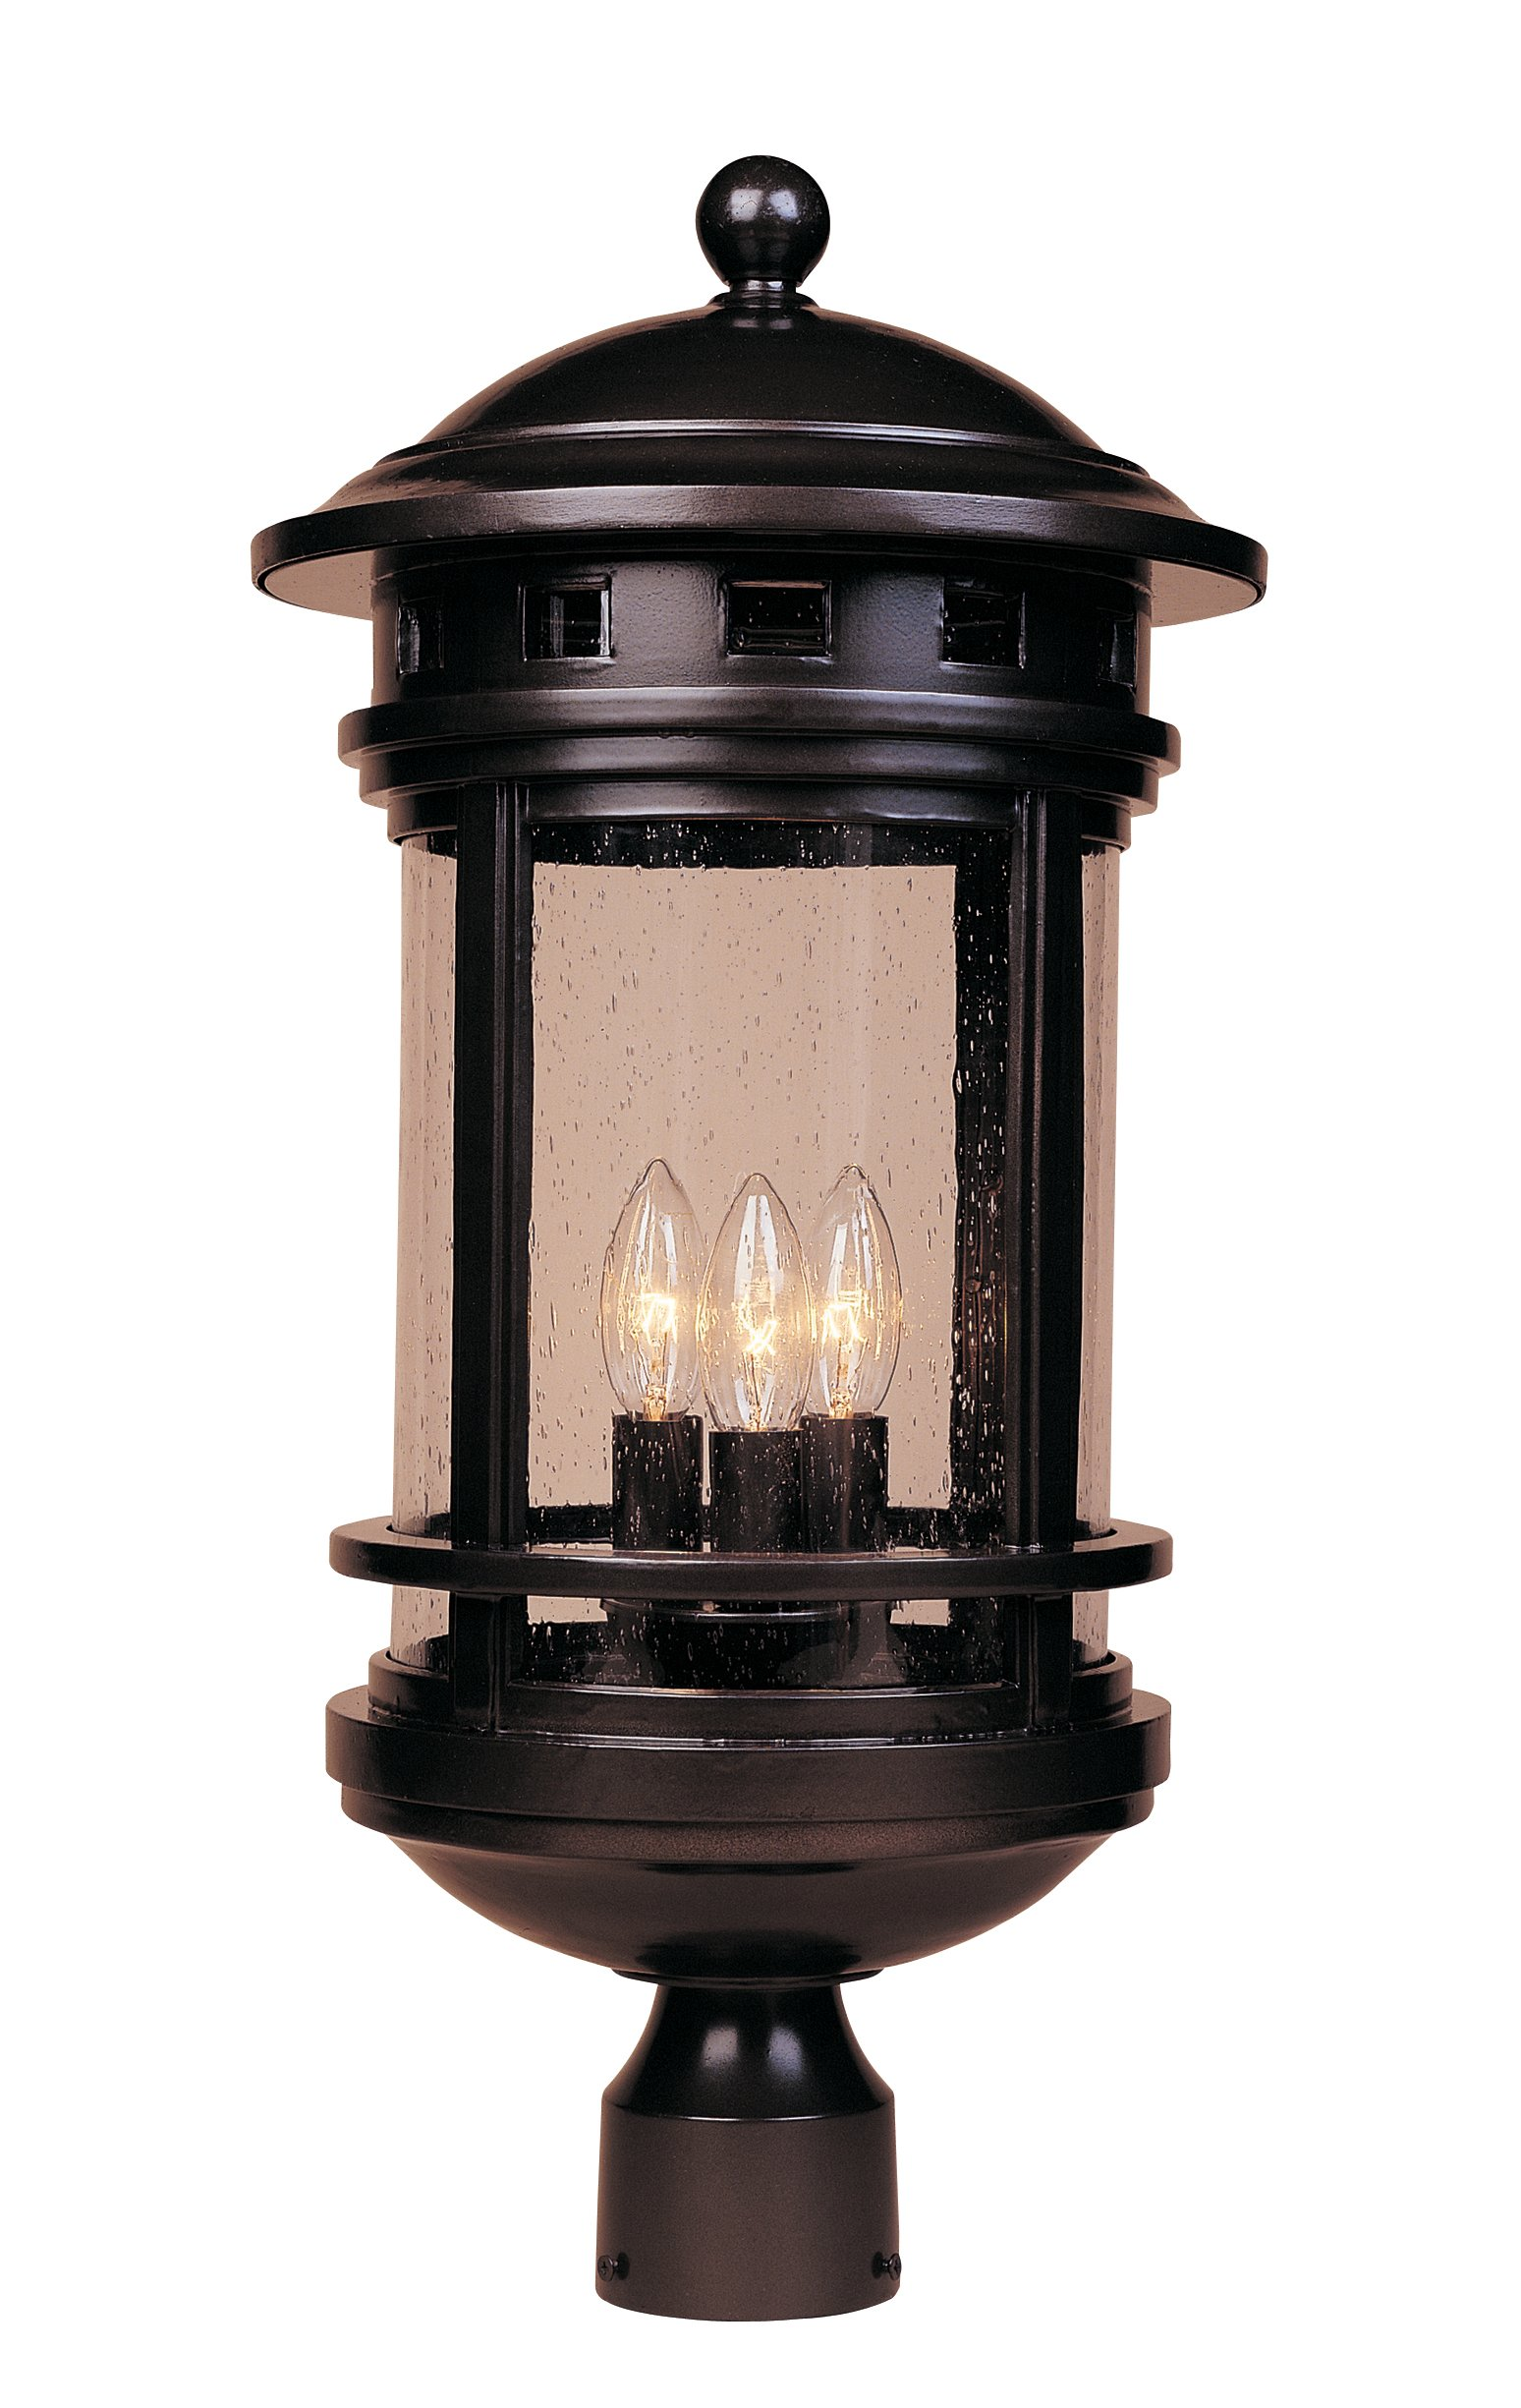 Designers Fountain 2396-ORB Sedona Post Lanterns, Oil Rubbed Bronze